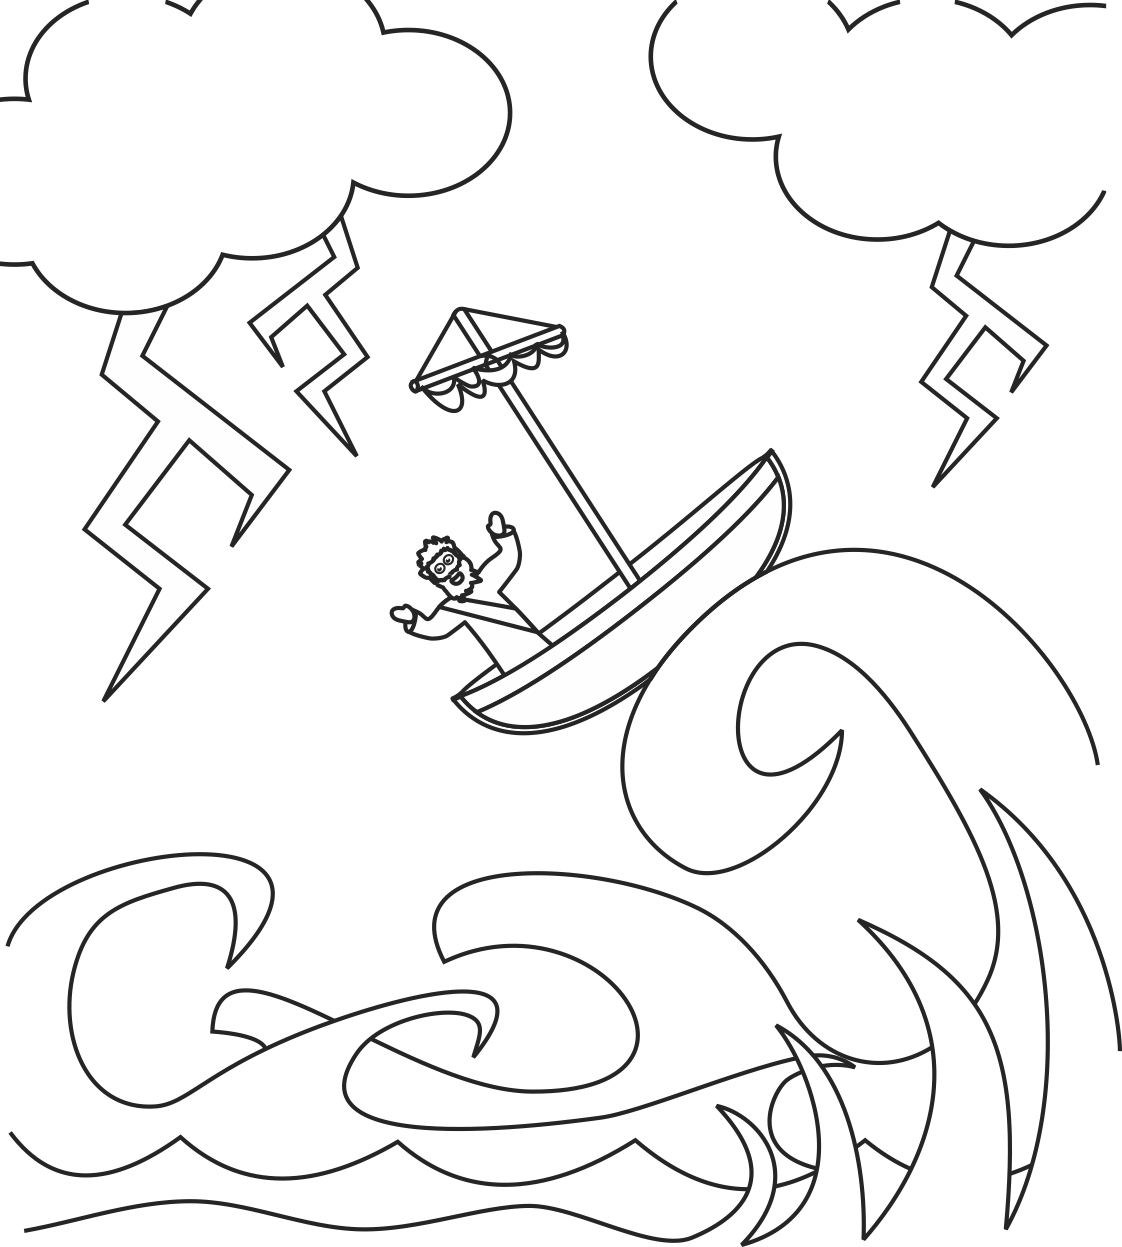 My Children's Curriculum: Jesus calms the storm coloring